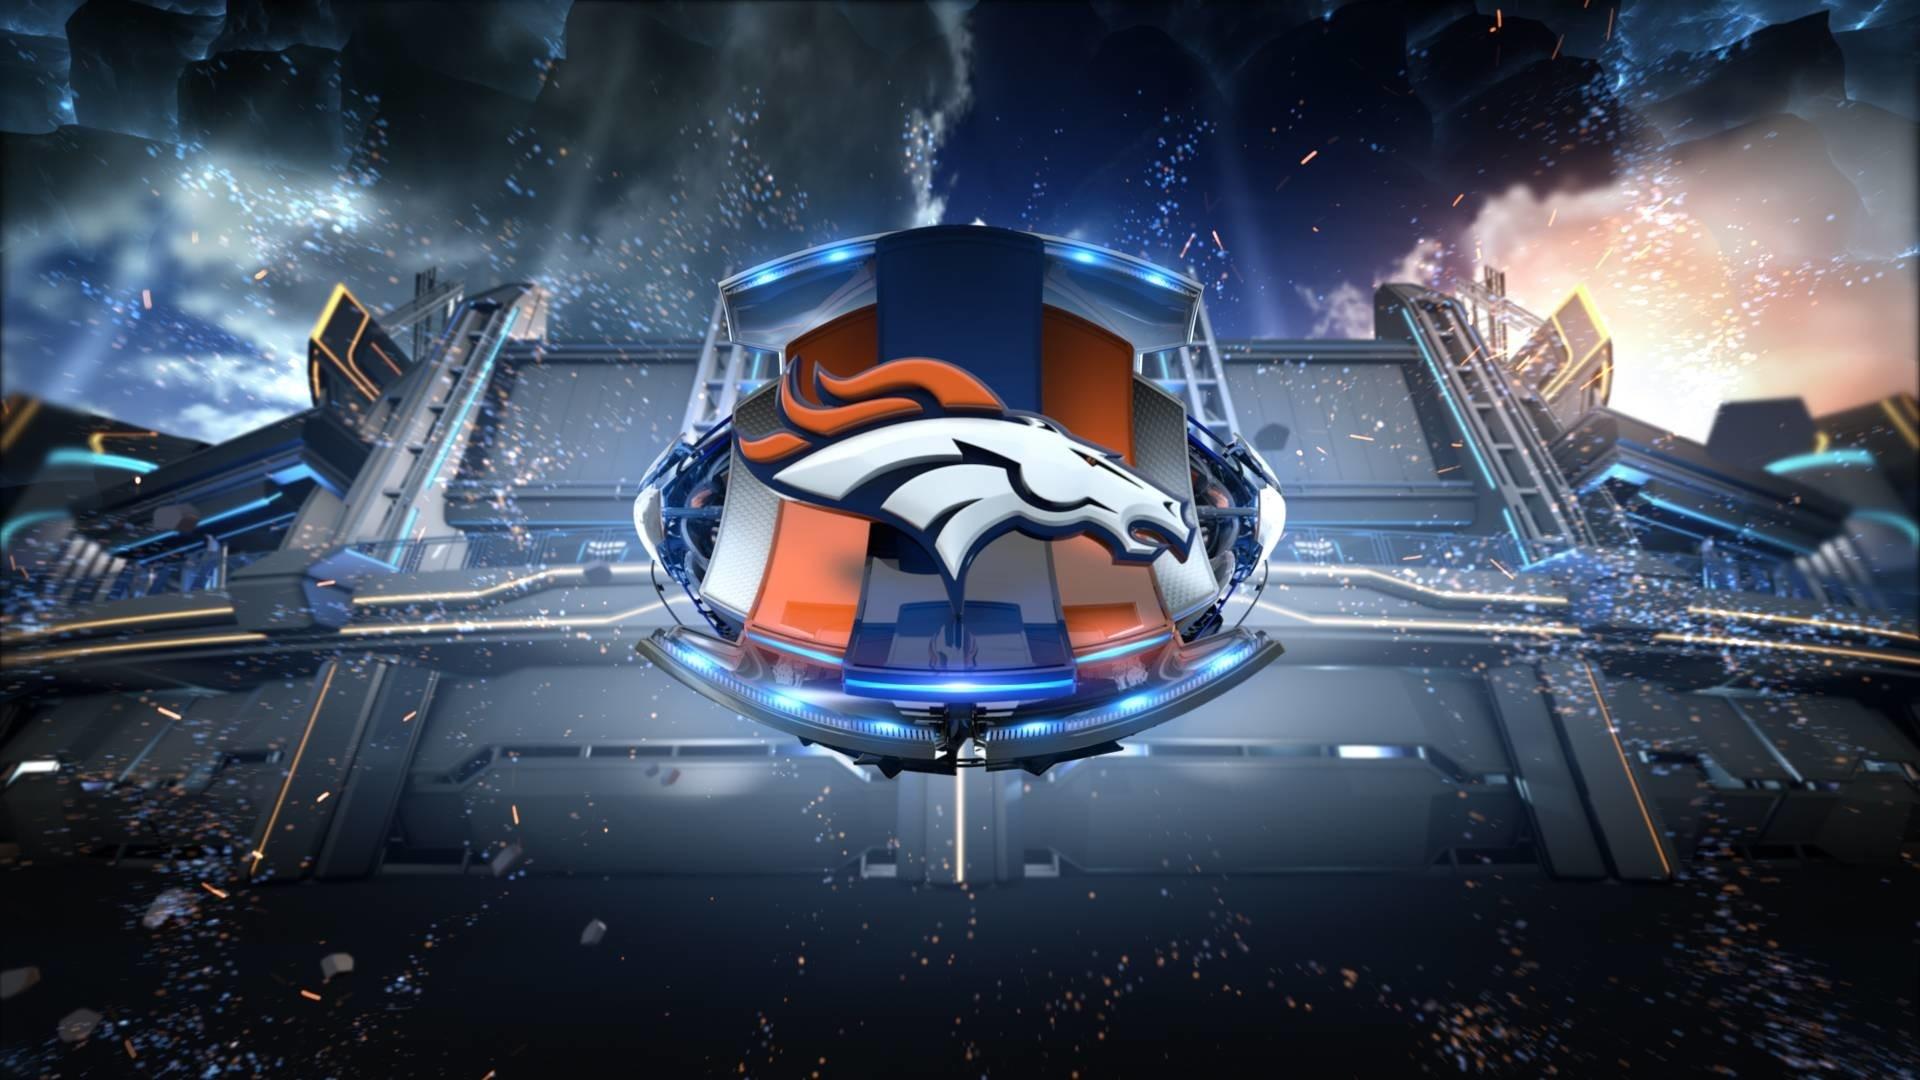 Denver Broncos computer wallpaper